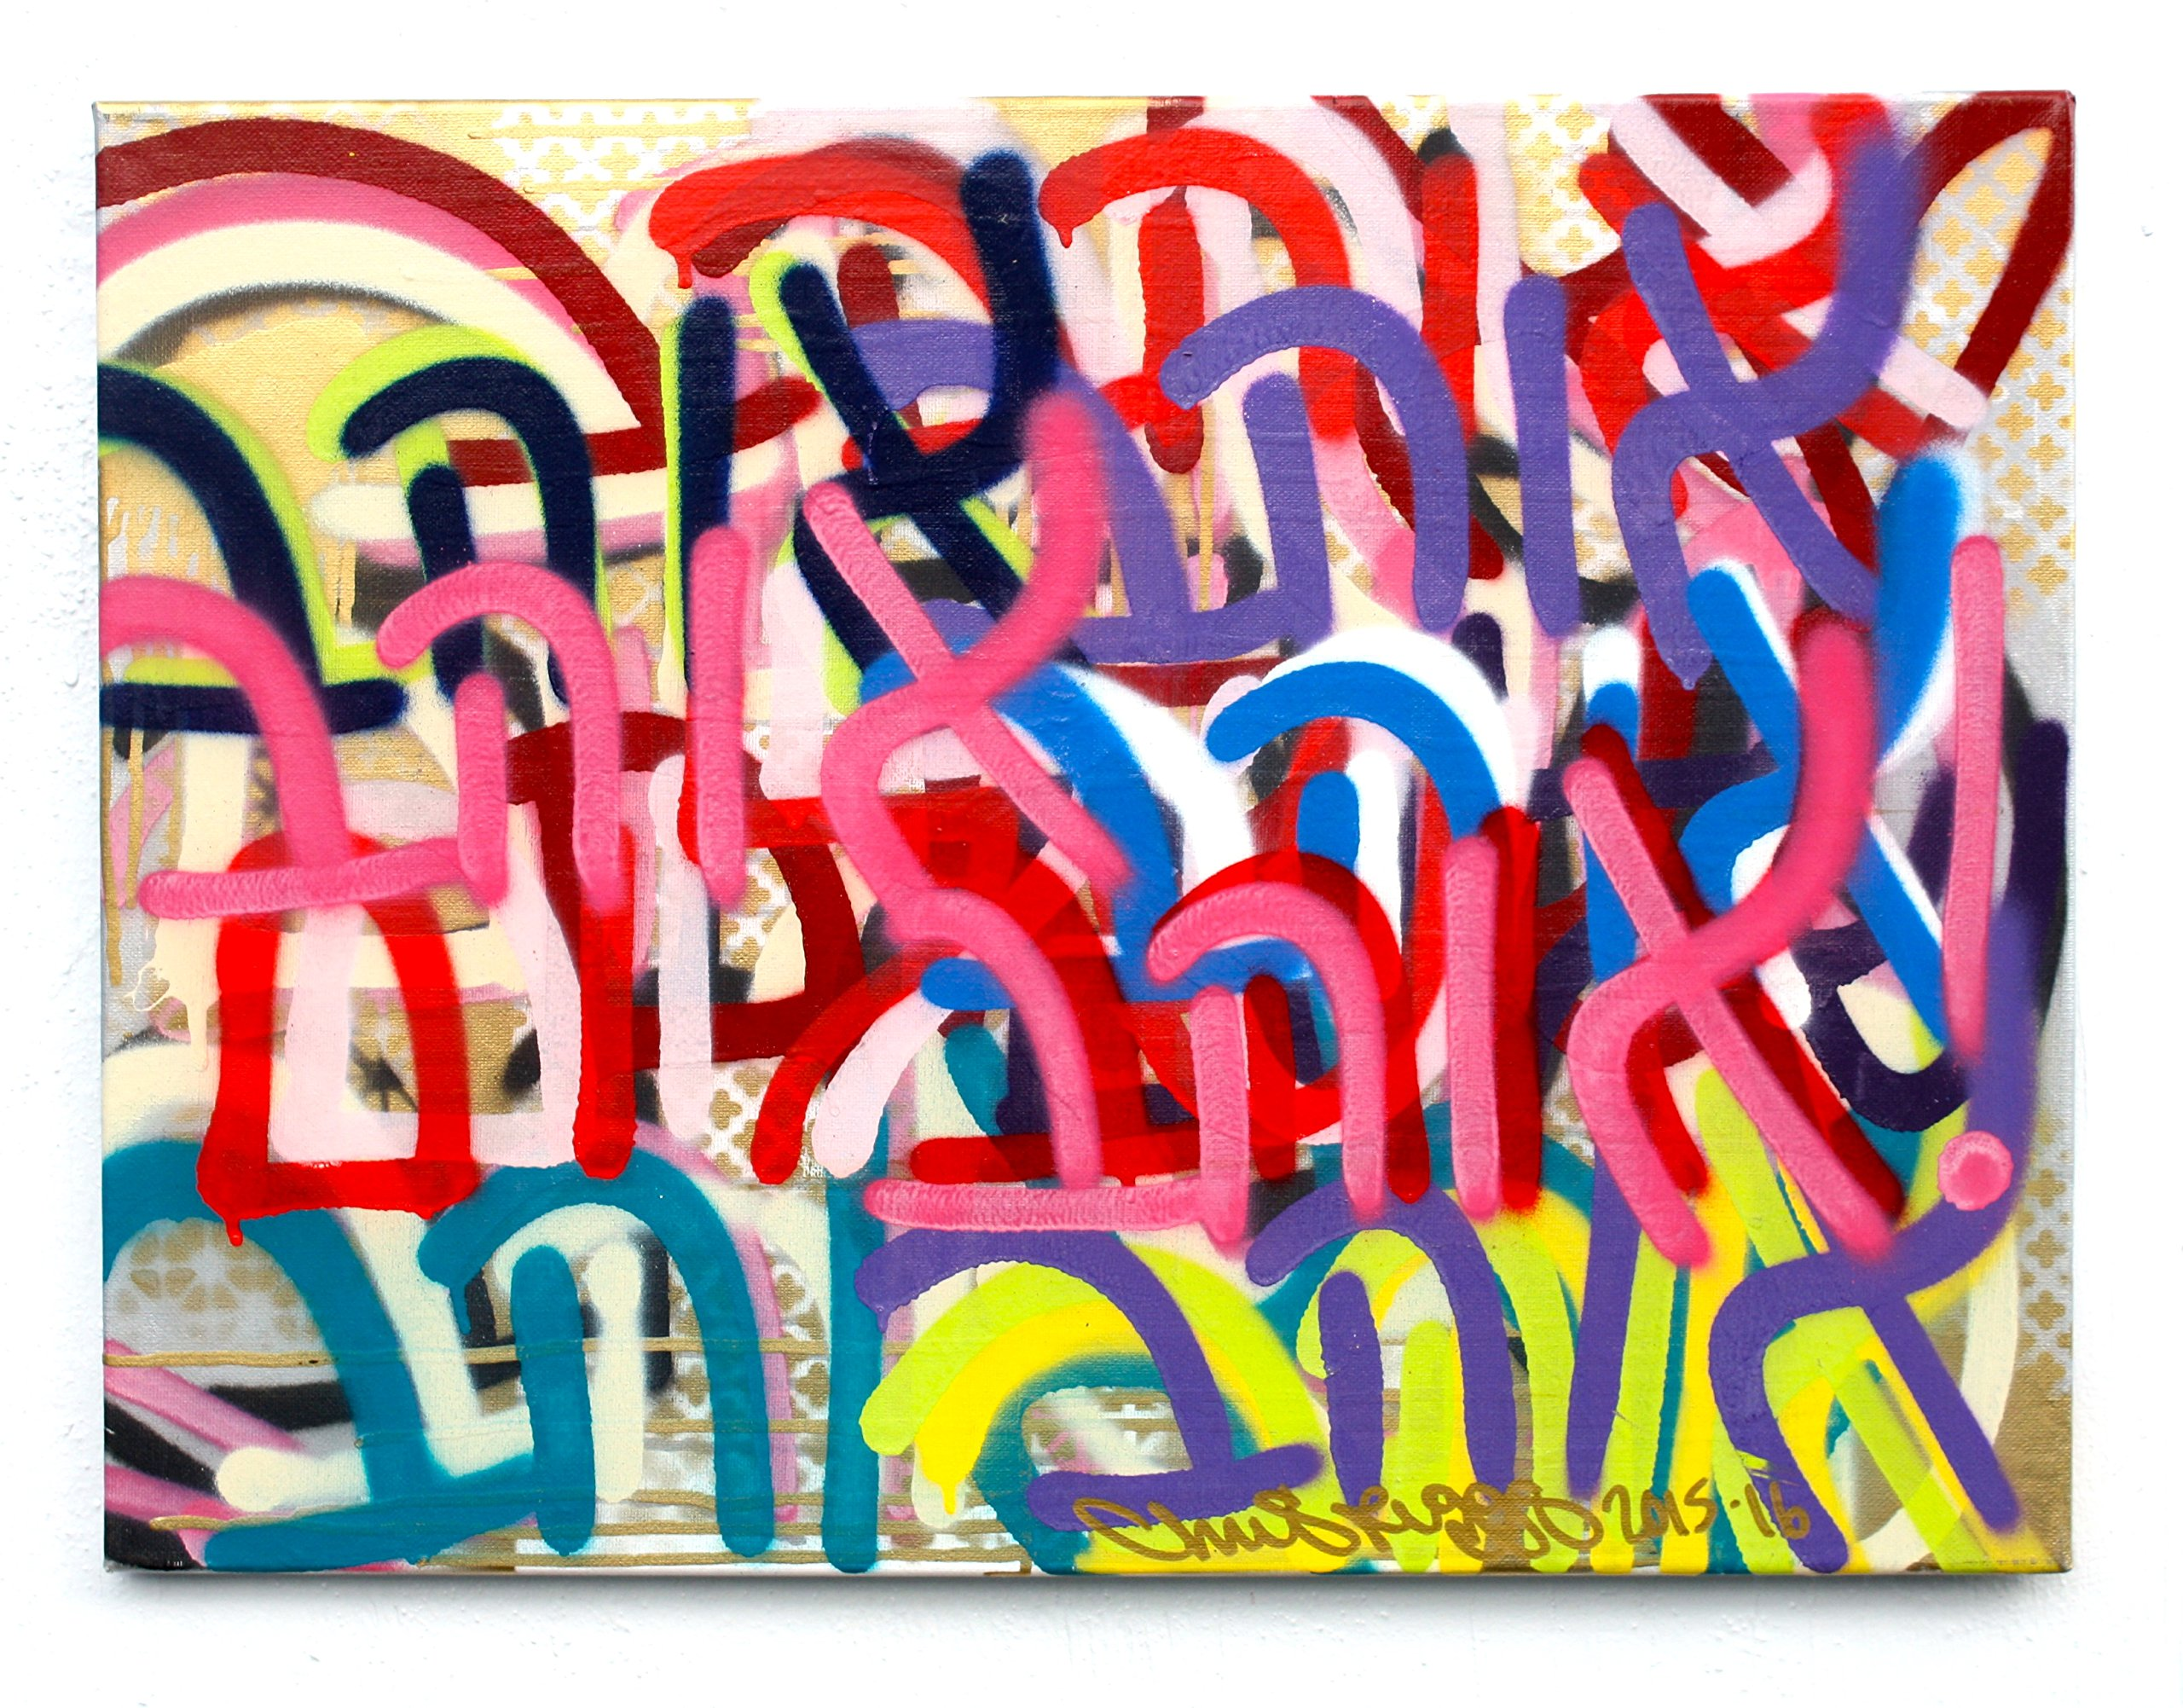 CHRIS RIGGS Original Love Hebrew fine art painting 24'' x 18'' pop street art spray paint NYC acrylic contemporary modern art urban canvas